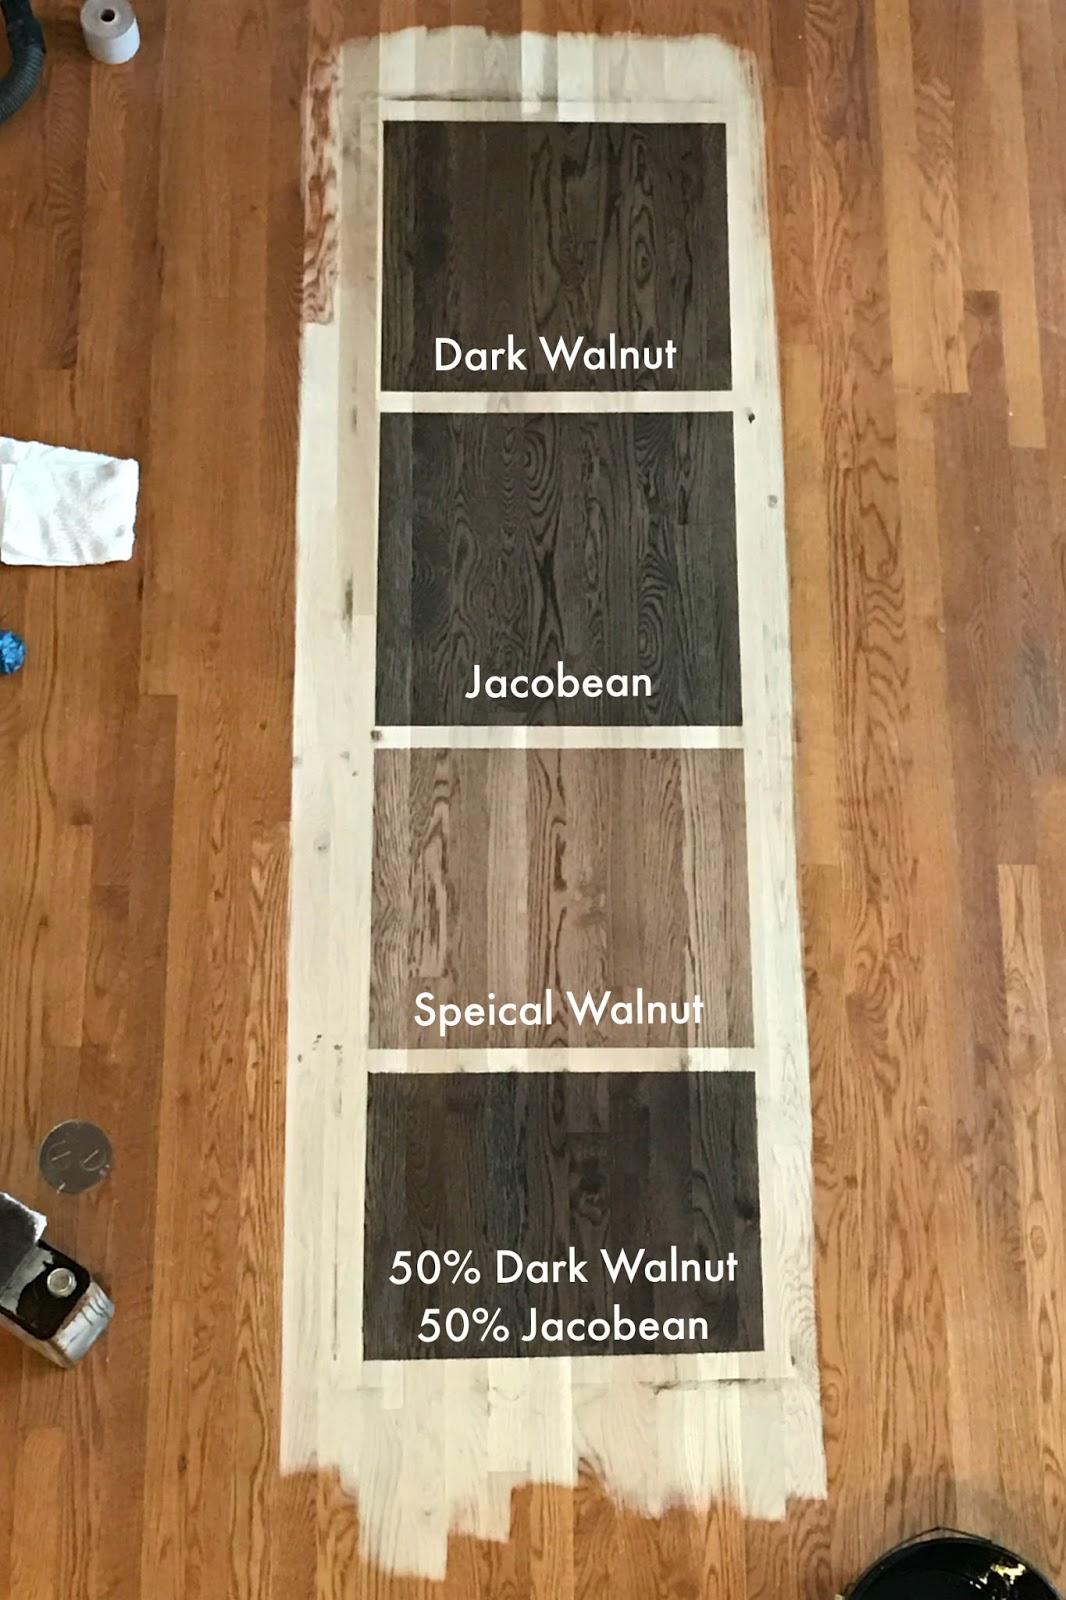 Jacobean Vs Dark Walnut Stain Holiday Hours